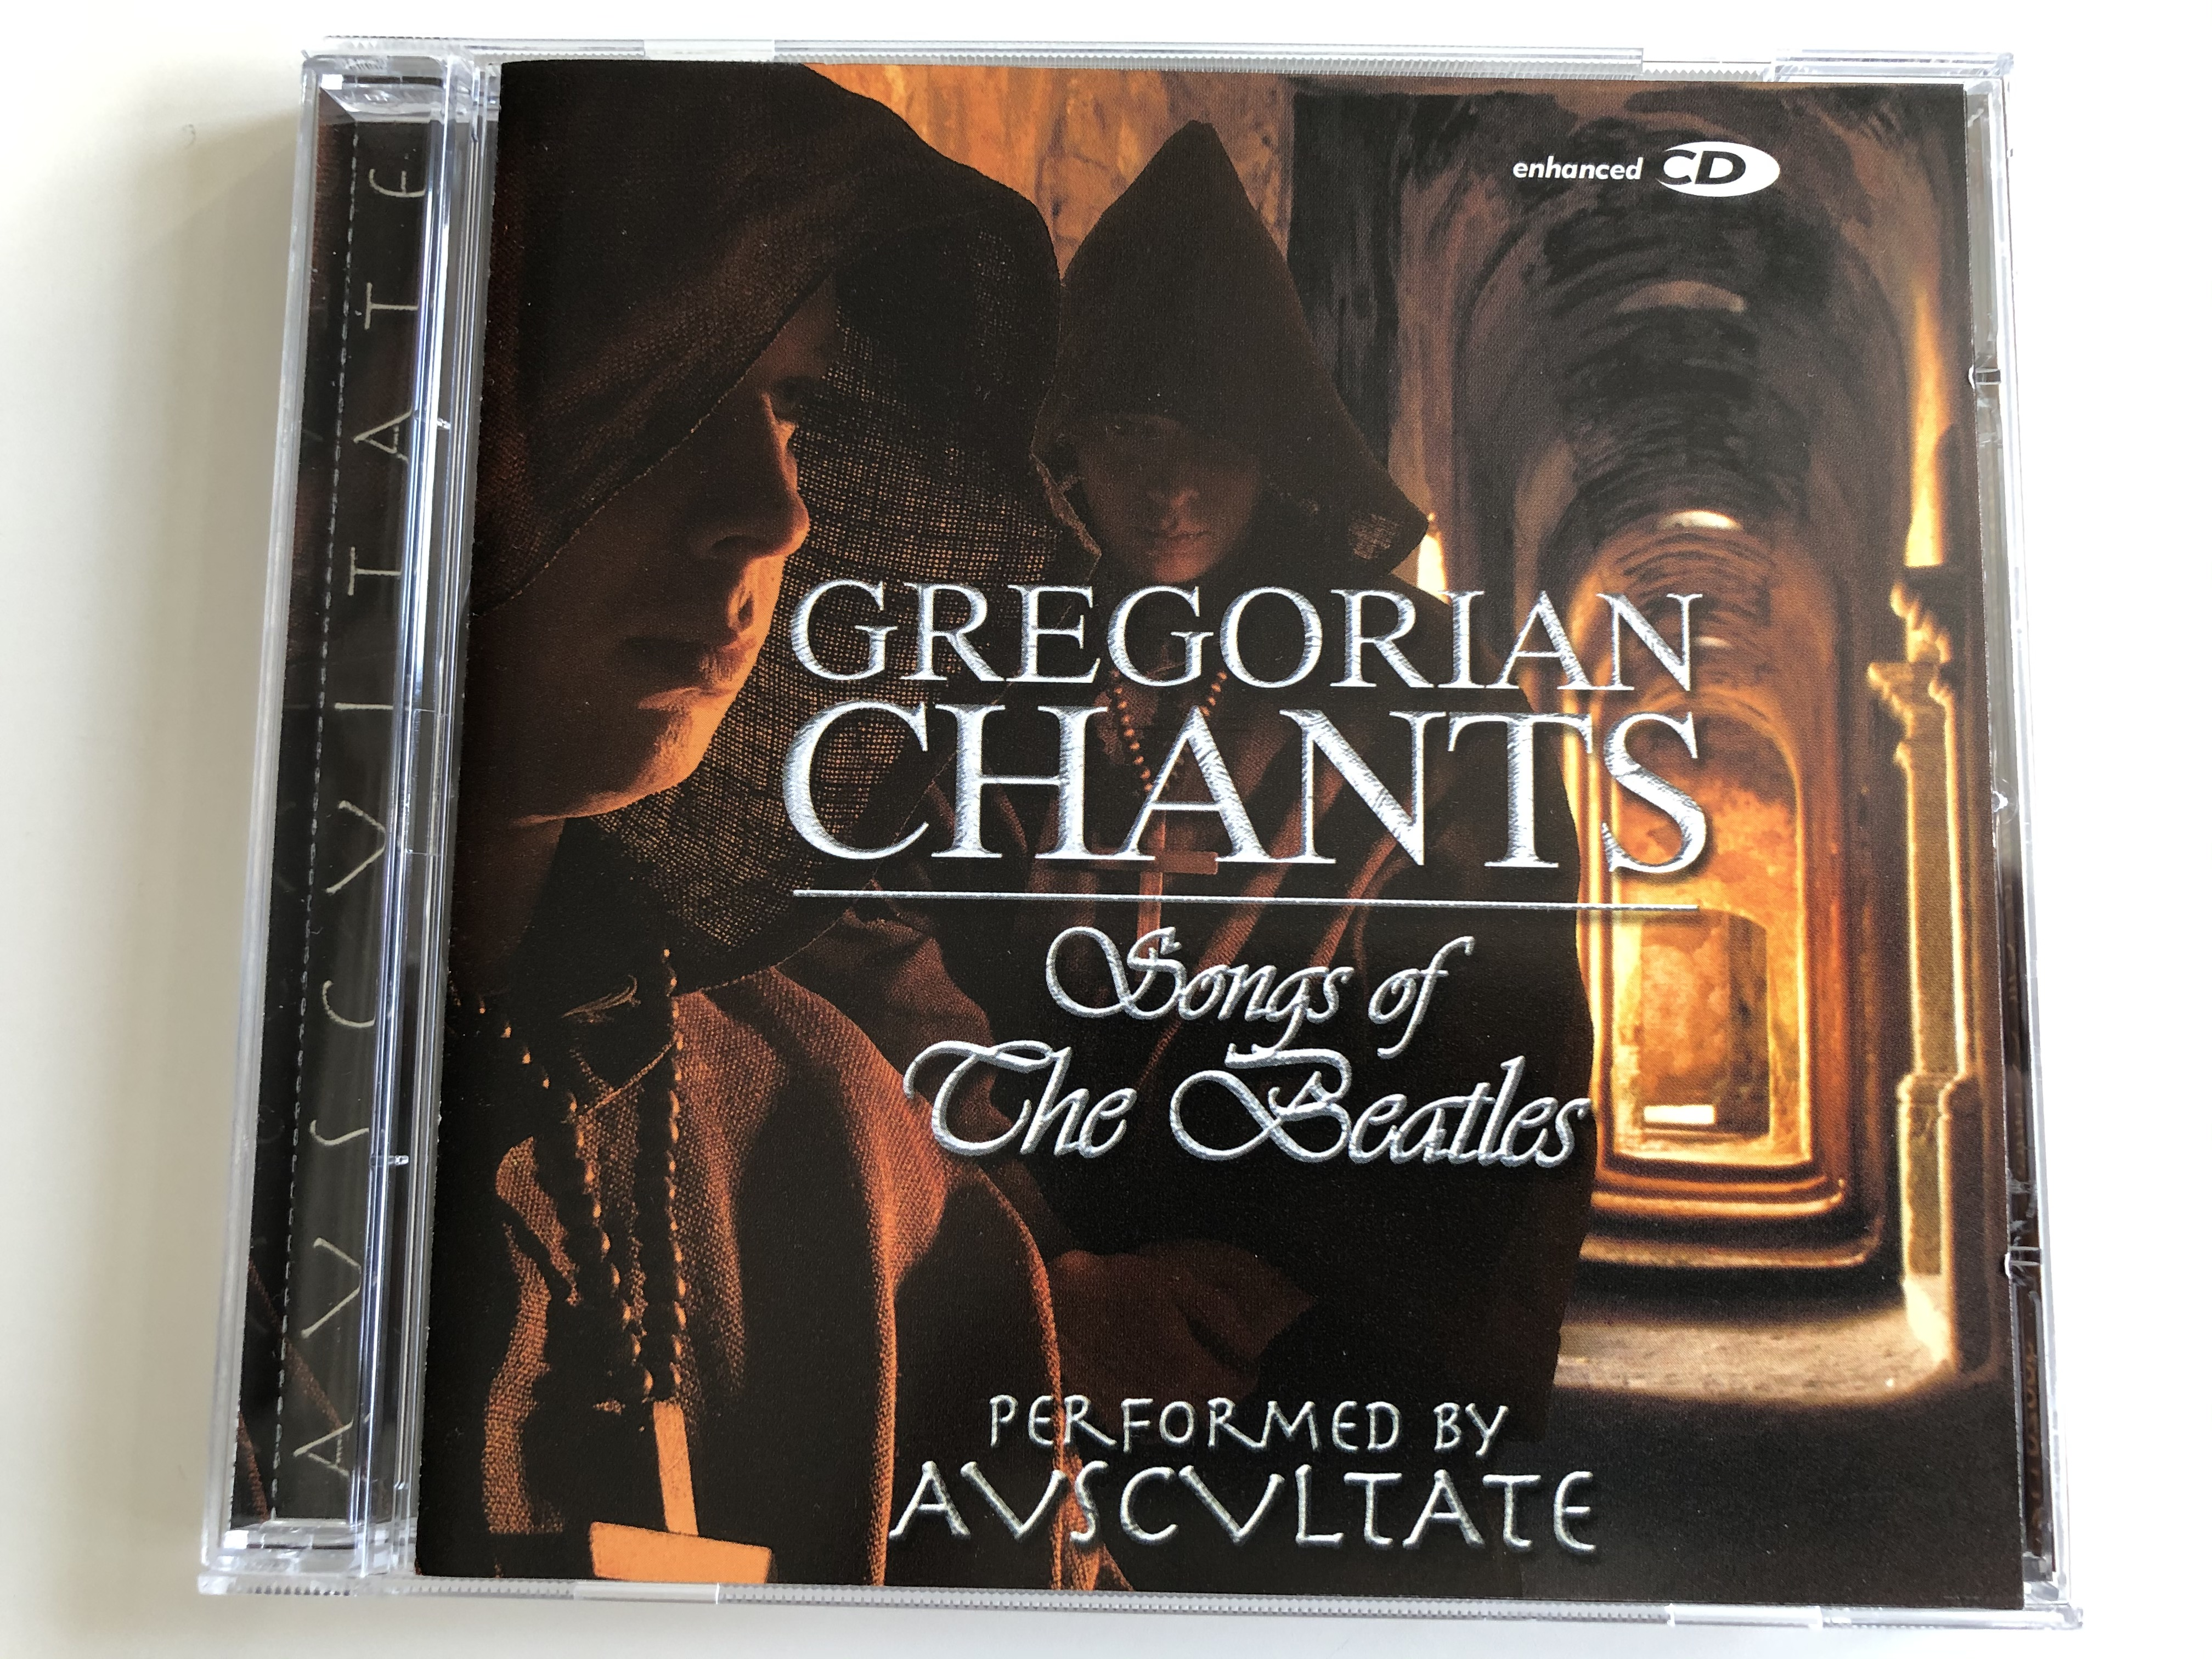 gregorian-chants-songs-of-the-beatles-performed-by-avscvltate-elap-music-audio-cd-2003-50020112-1-.jpg